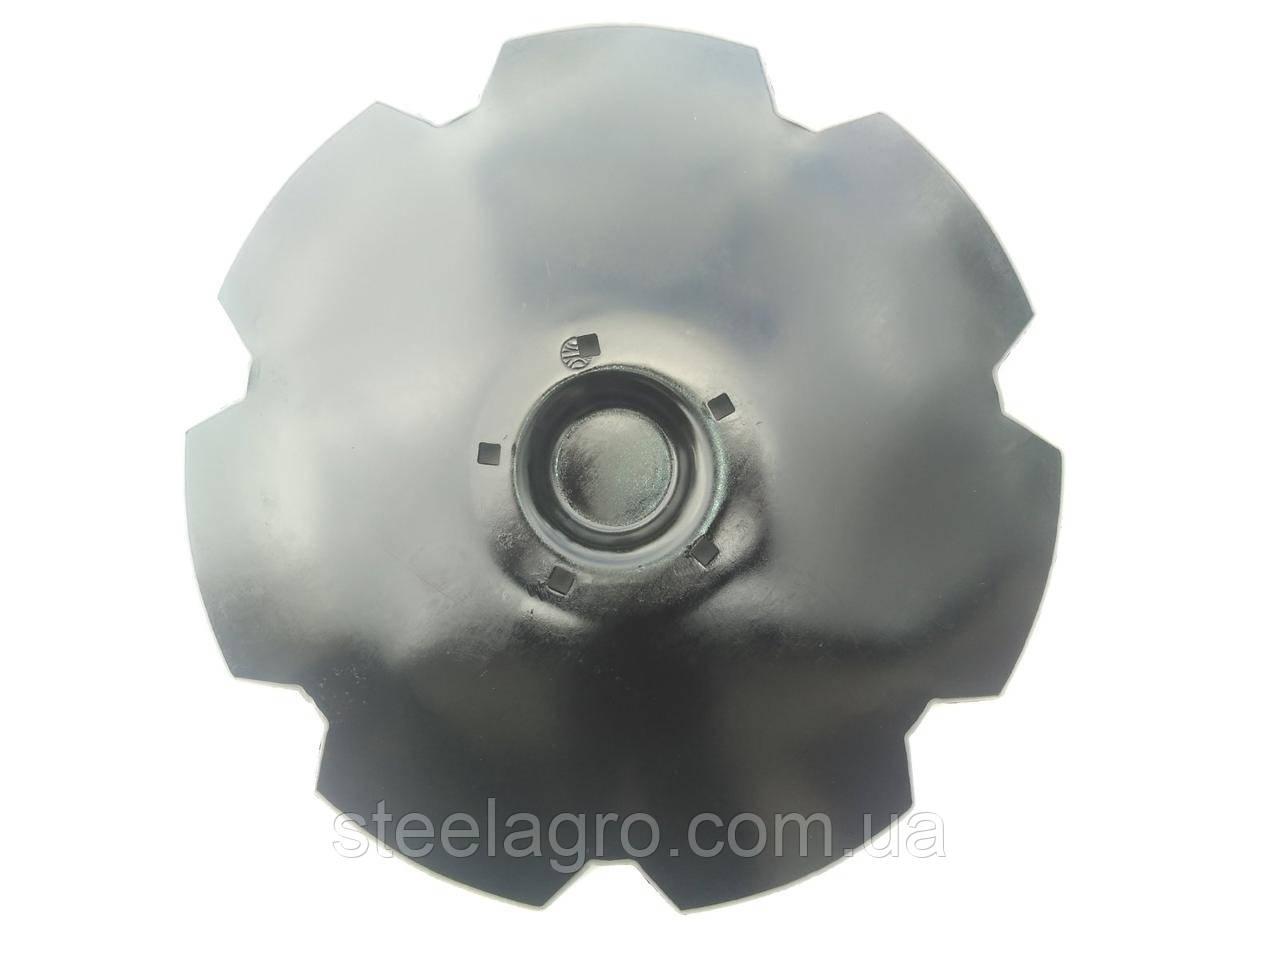 Диск борони Lemken Gigant 10S, Gigant 12S D-620 s-6мм, 5 отв, кв13мм ст30Mnb5 Лемкен Гігант (34910034)